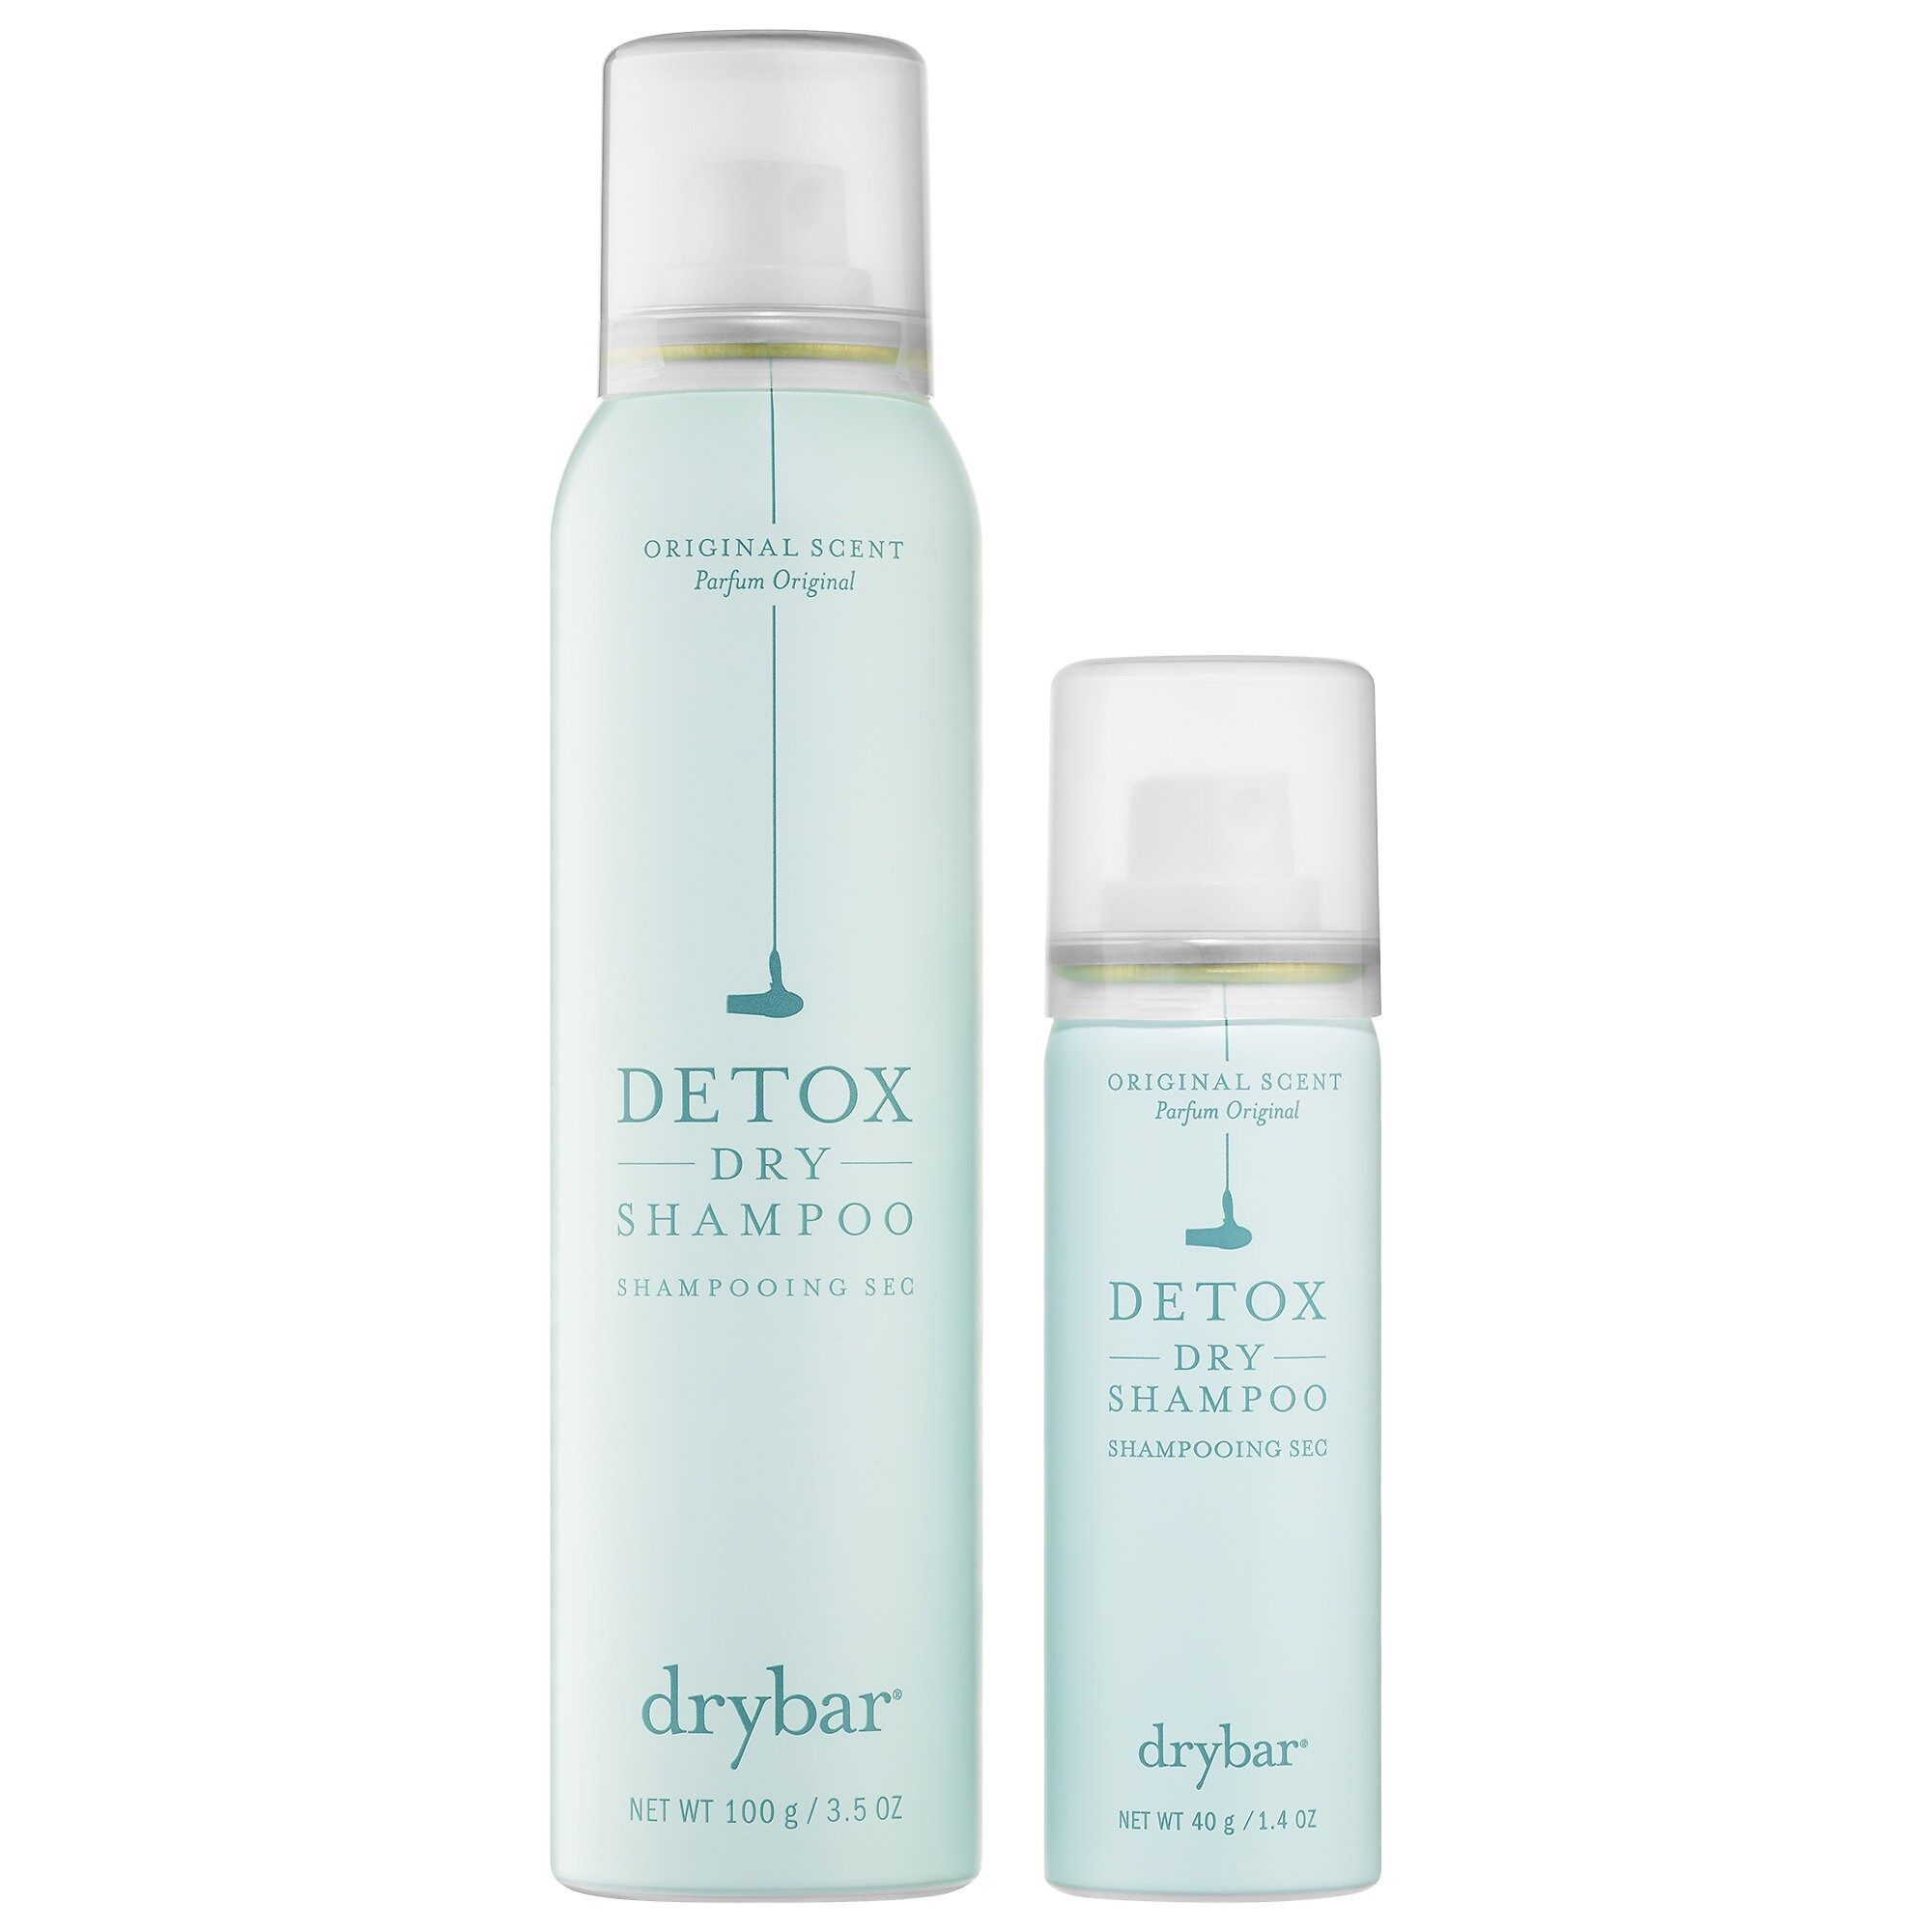 Double Dose Of Detox Dry Shampoo Drybar Sephora Dry Shampoo Travel Size Products Sephora